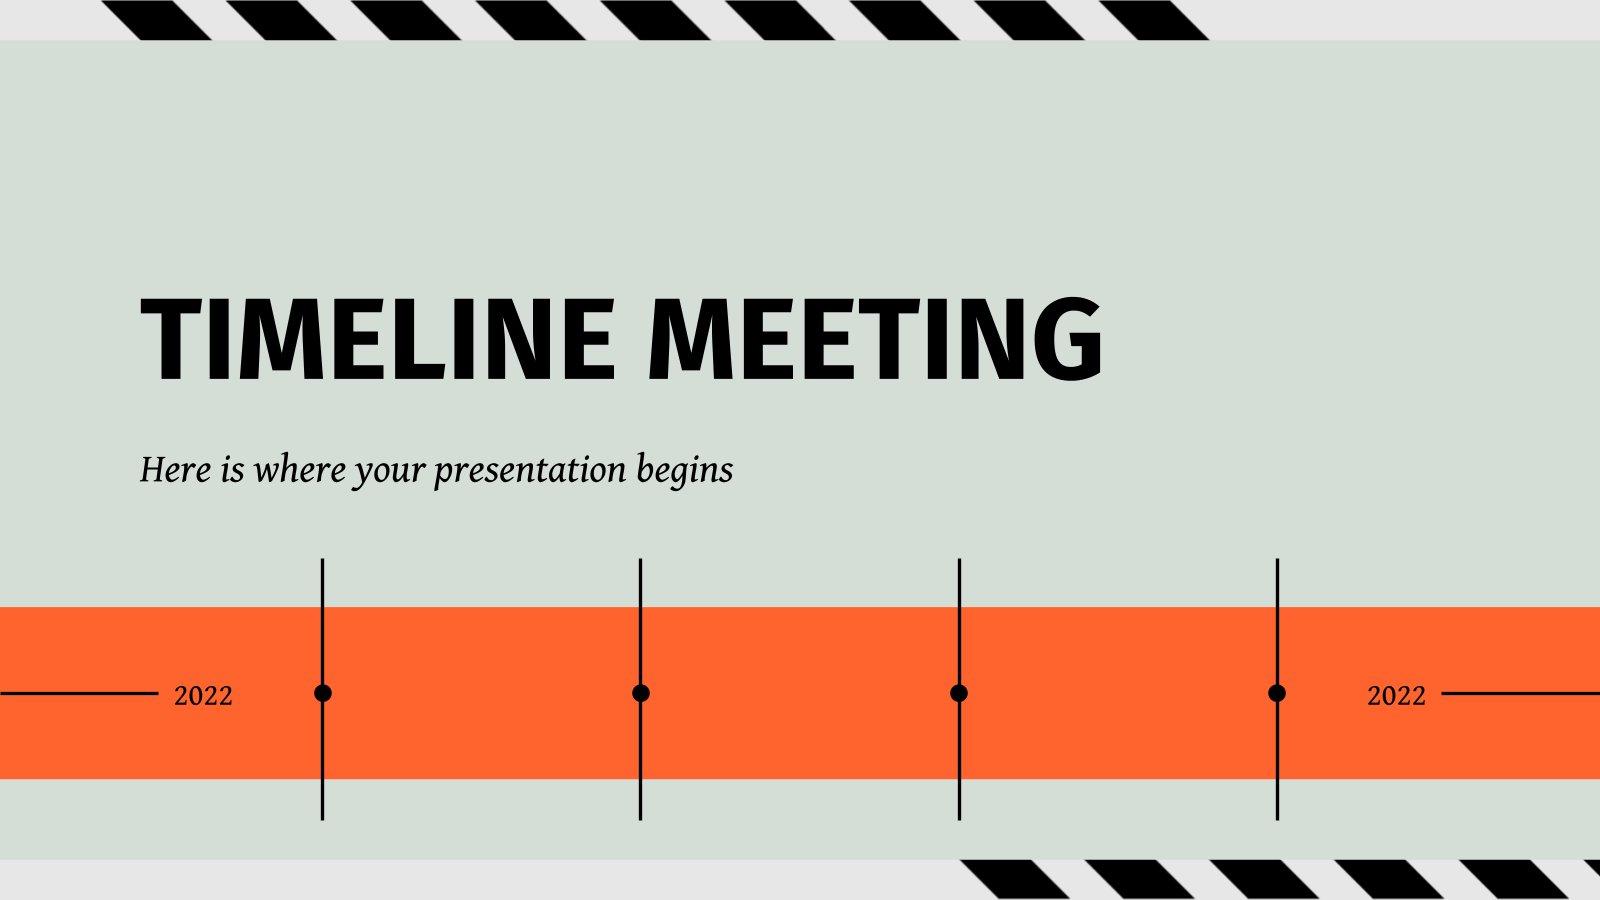 Timeline Meeting presentation template